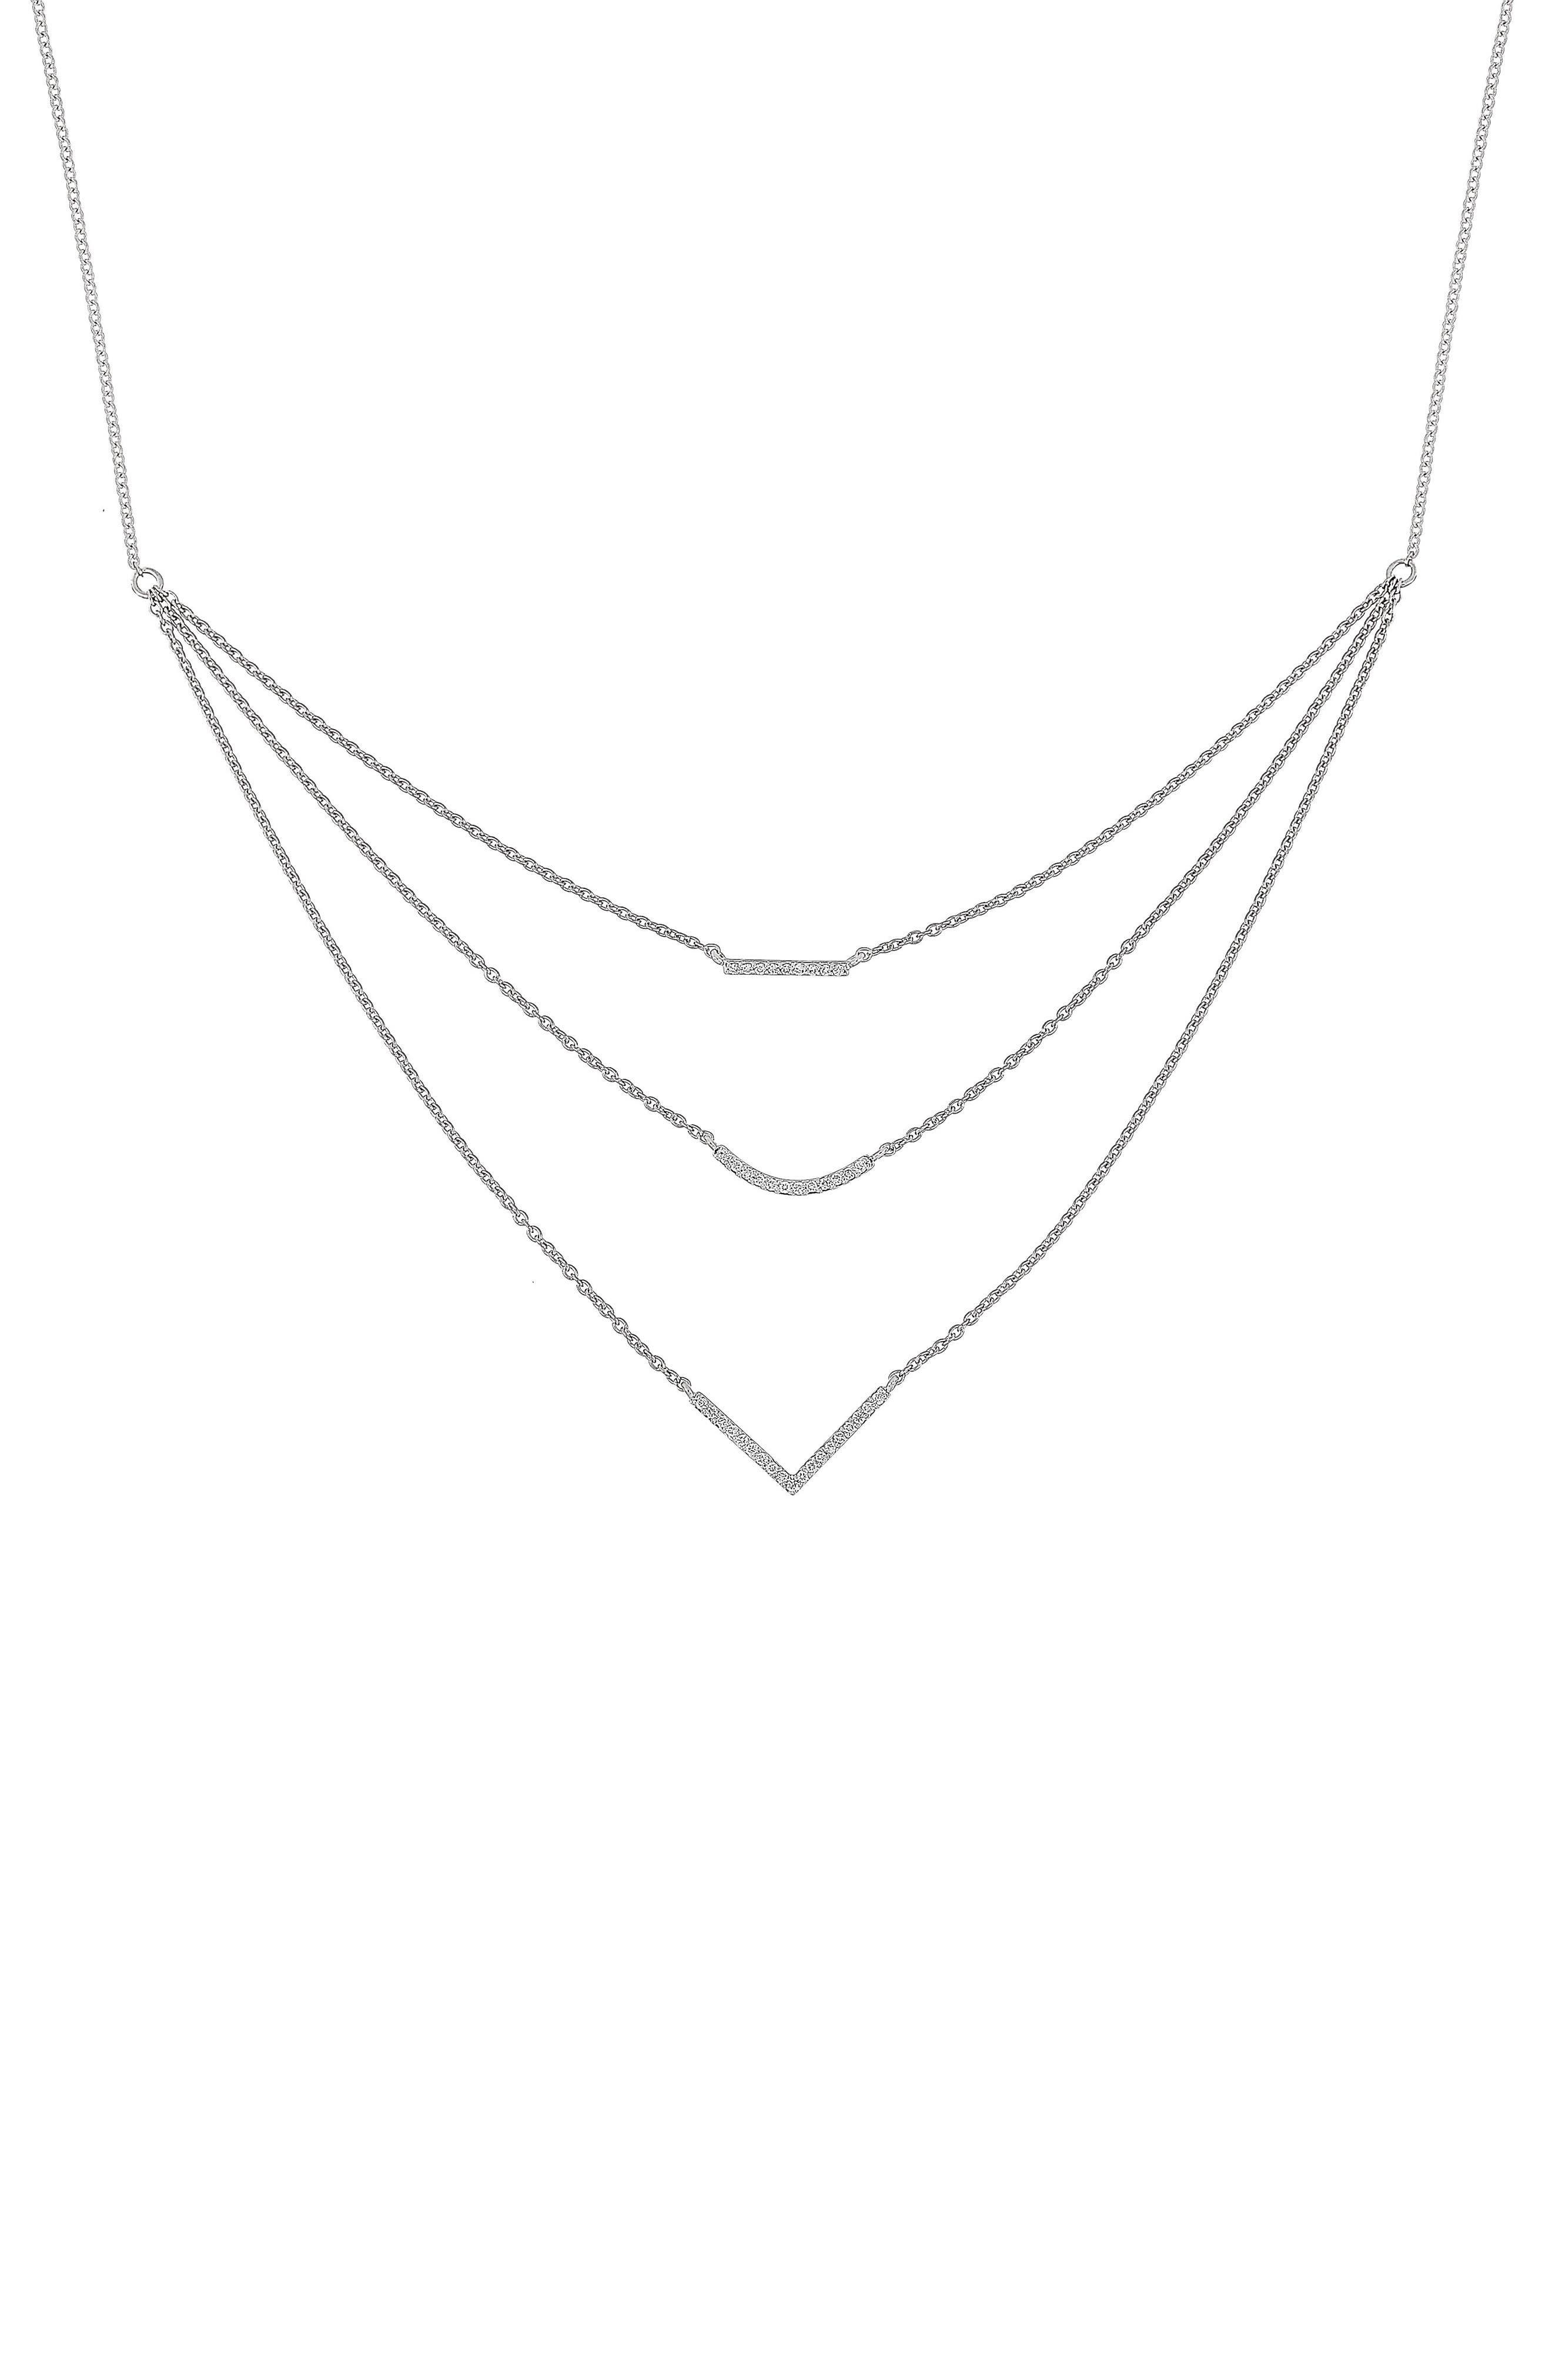 Multistrand Diamond Pendant Necklace,                             Main thumbnail 1, color,                             WHITE GOLD